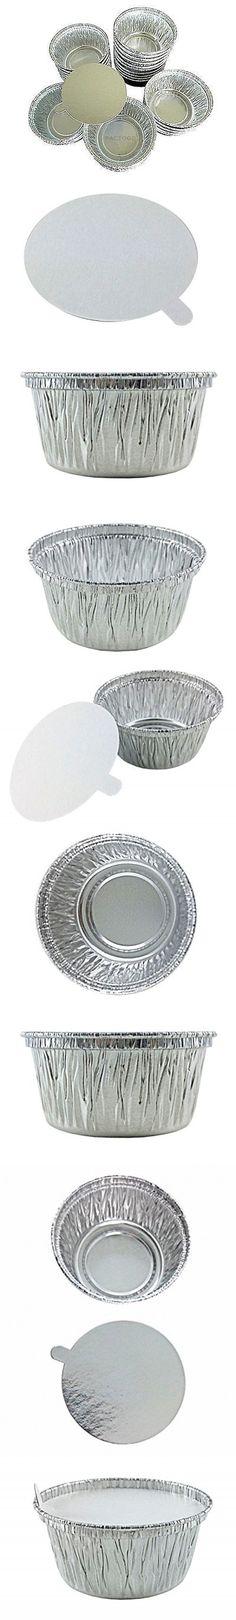 Handi-Foil of America 4 oz. Aluminum Foil C w/Board Lid -Disposable Ramekin/Cupcake/Tart Containers (pack of 50)